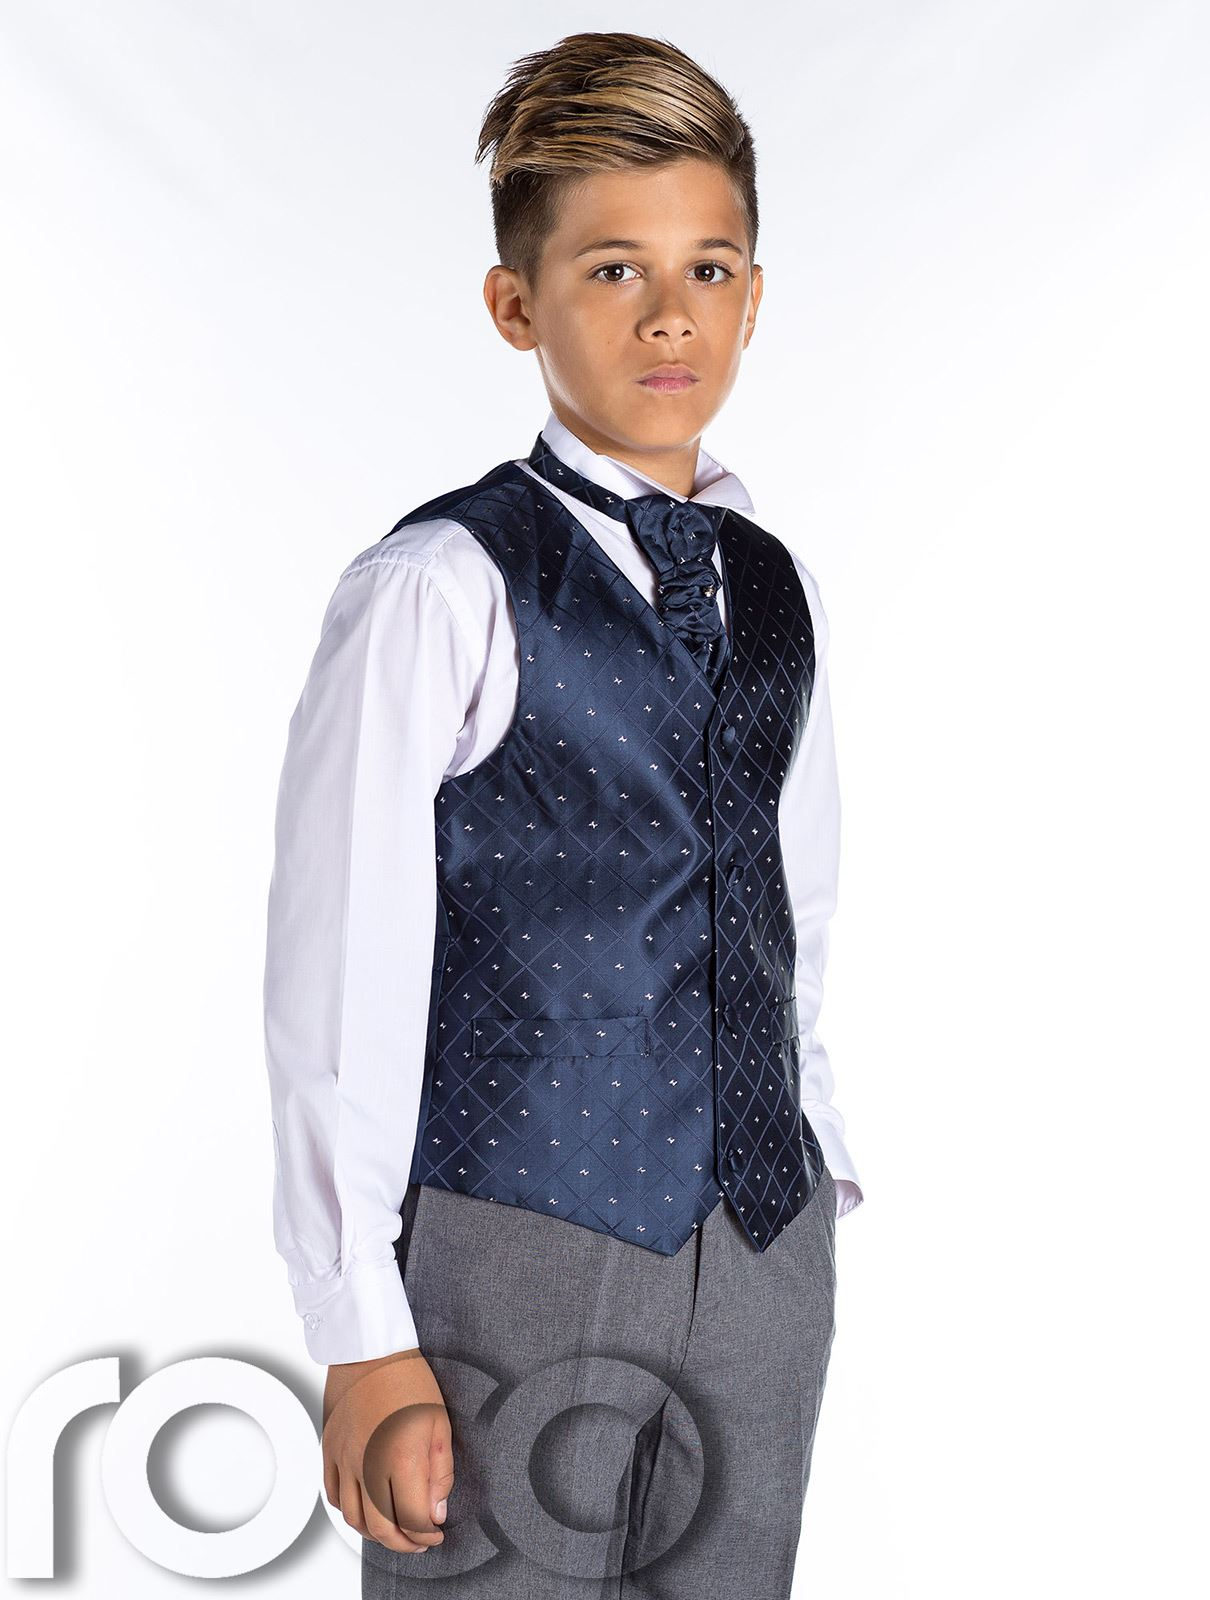 Boys Waistcoat Suit Page Boy Suit Boys Formal Suit Boys Prom Outfit | eBay